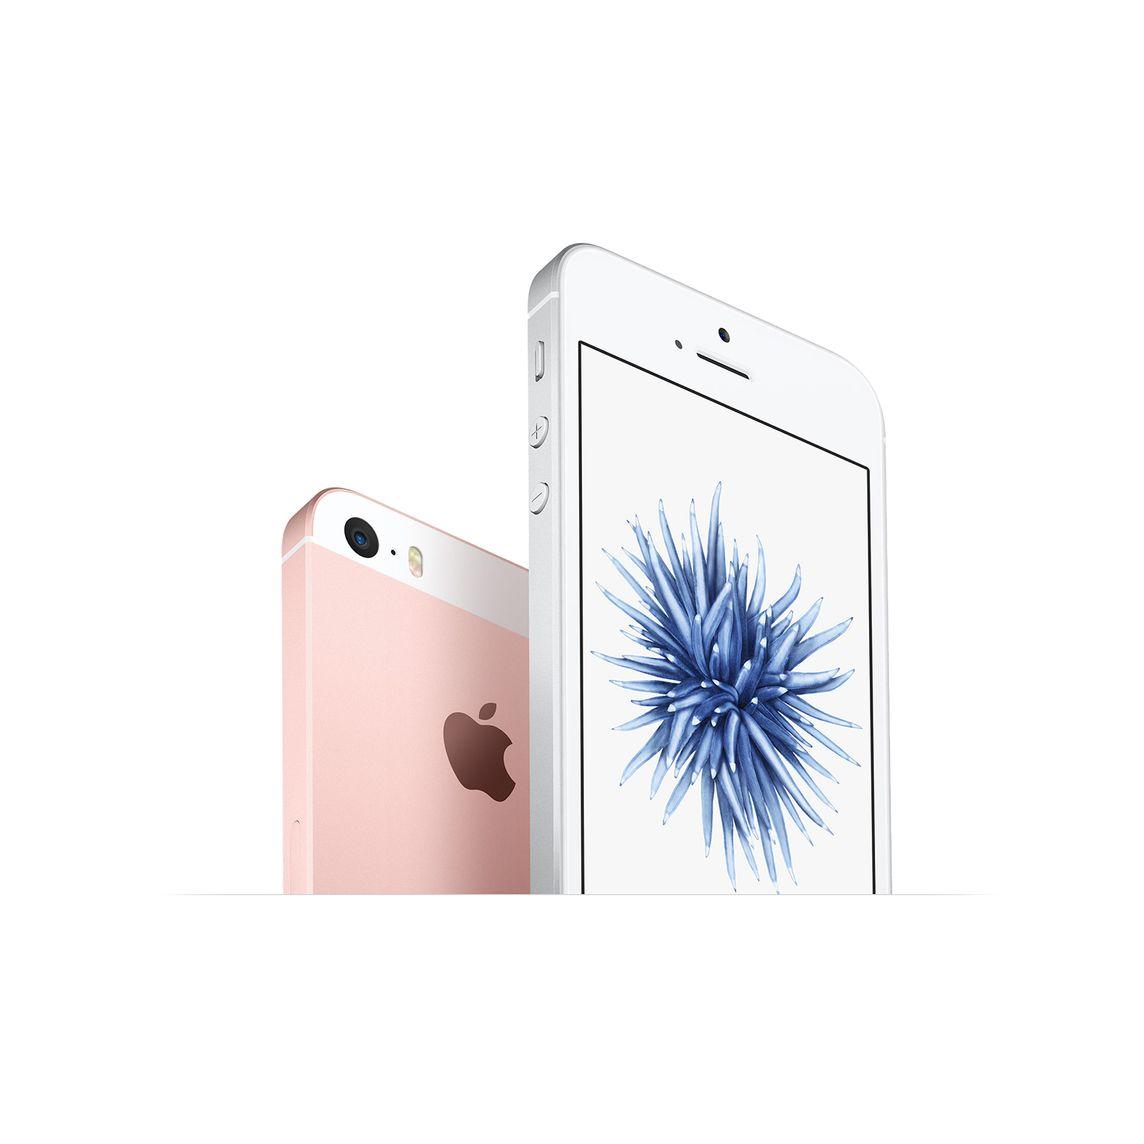 iPhone SE 32GB - Space Gray (Unlocked)